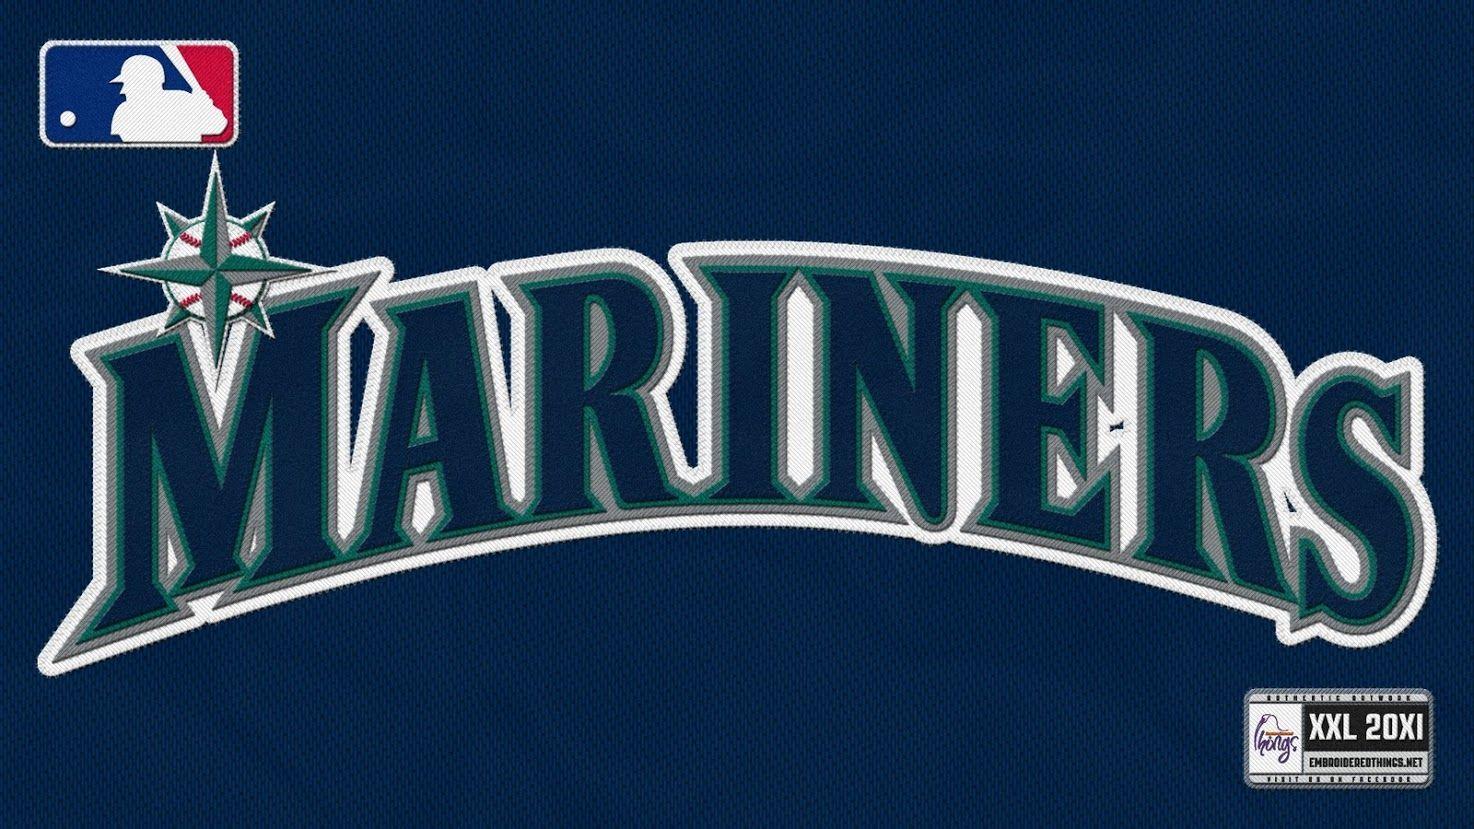 Seattle Mariners logo | Seattle mariners logo, Mariners ...